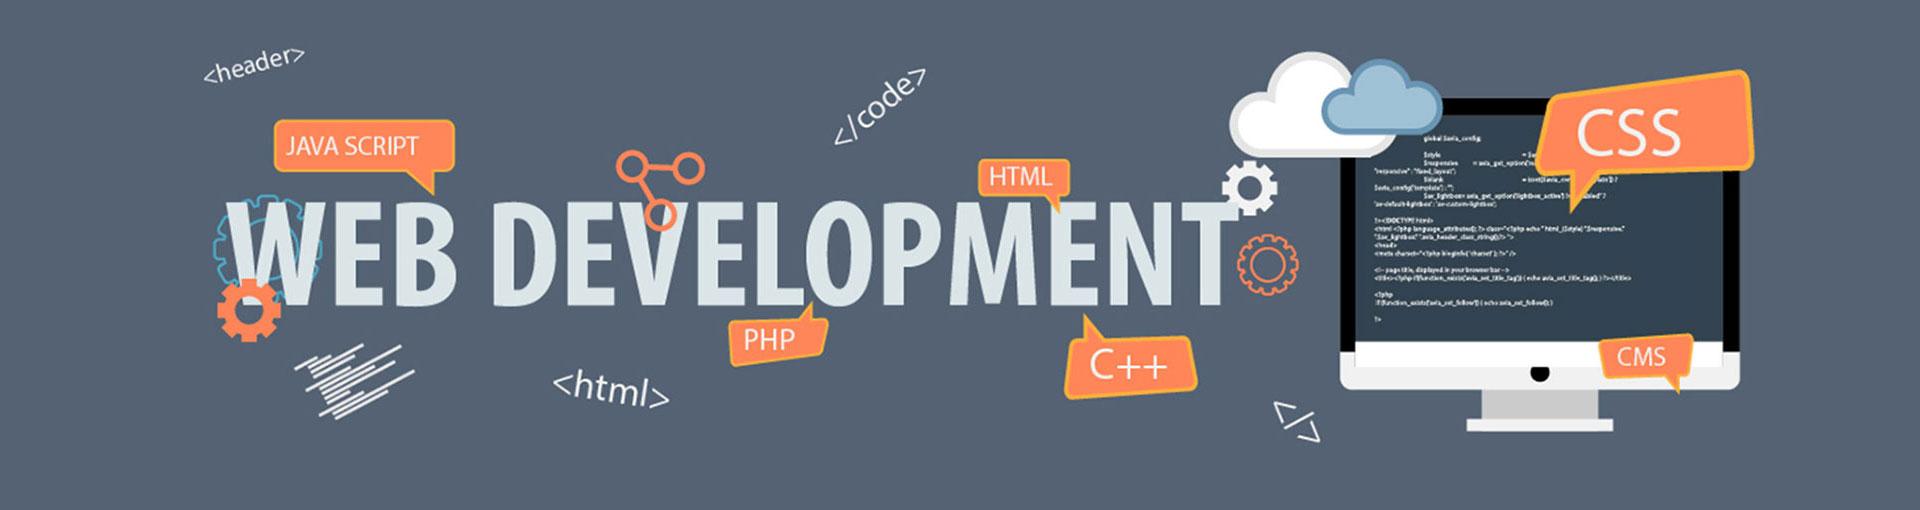 Website Development Company India, Web Development Services |